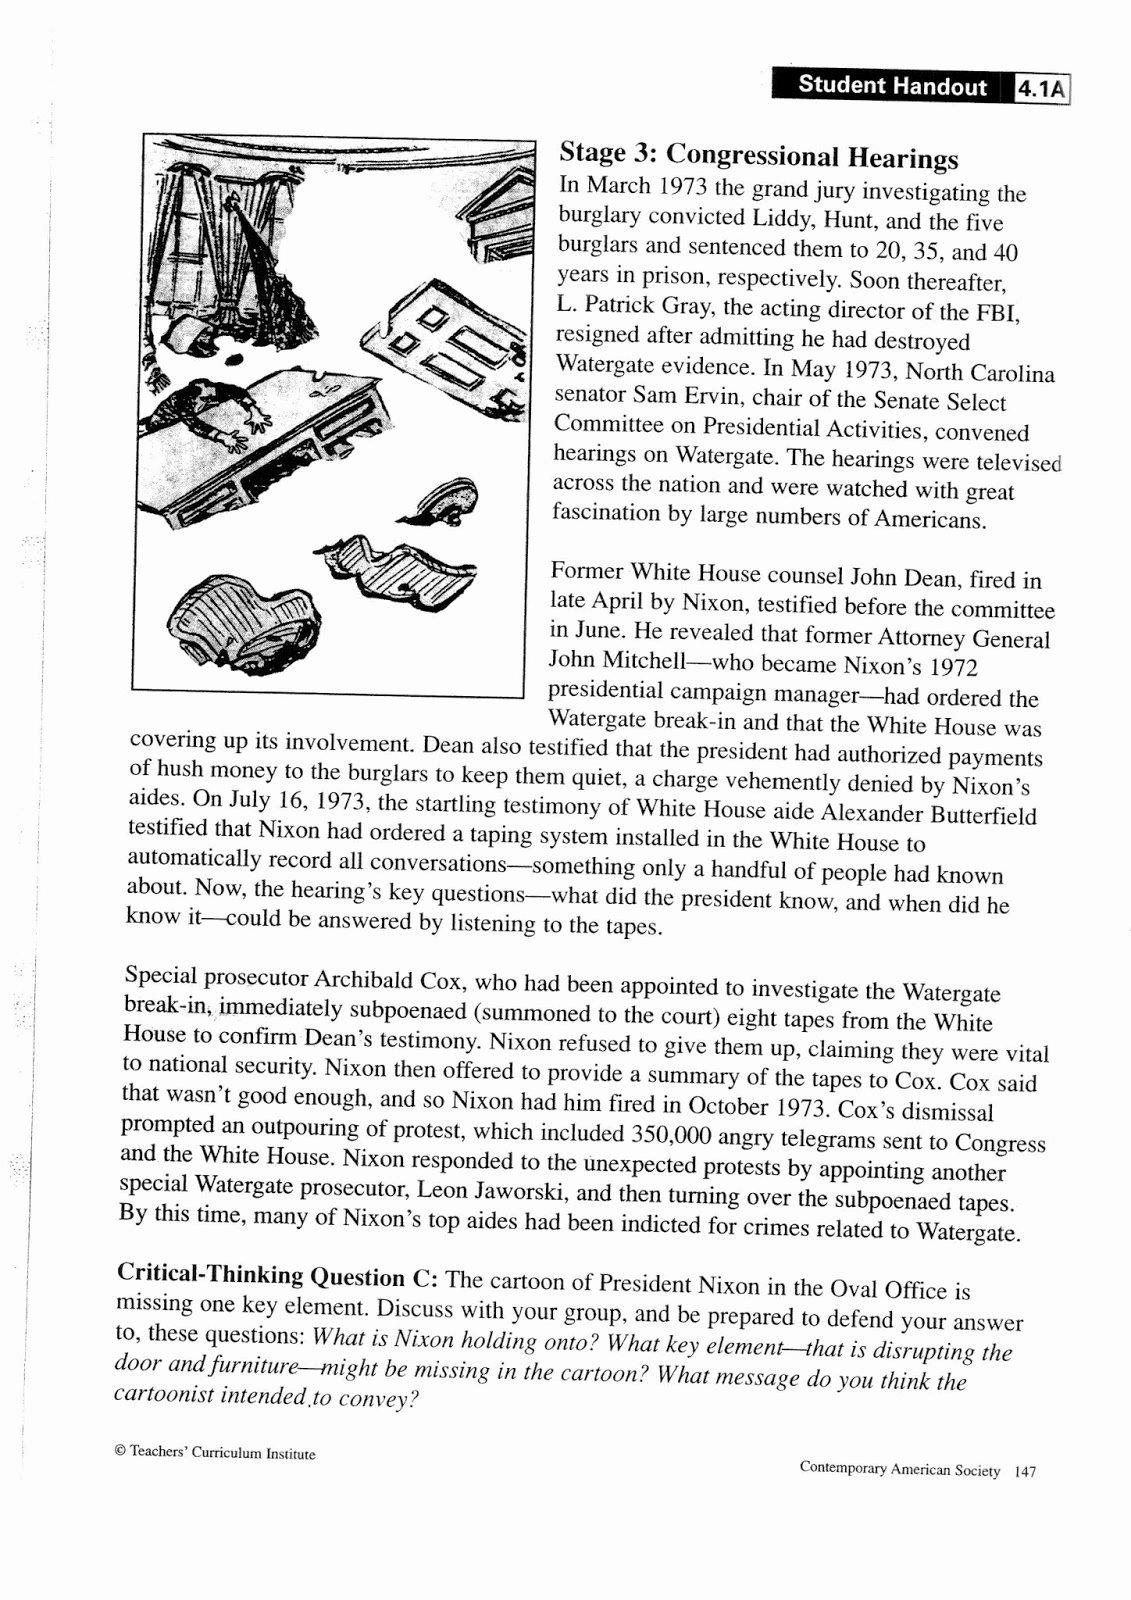 Political Cartoon Analysis Worksheet Elegant Mr Bravo S Pod Blog 1 4 Watergate Political Cartoon